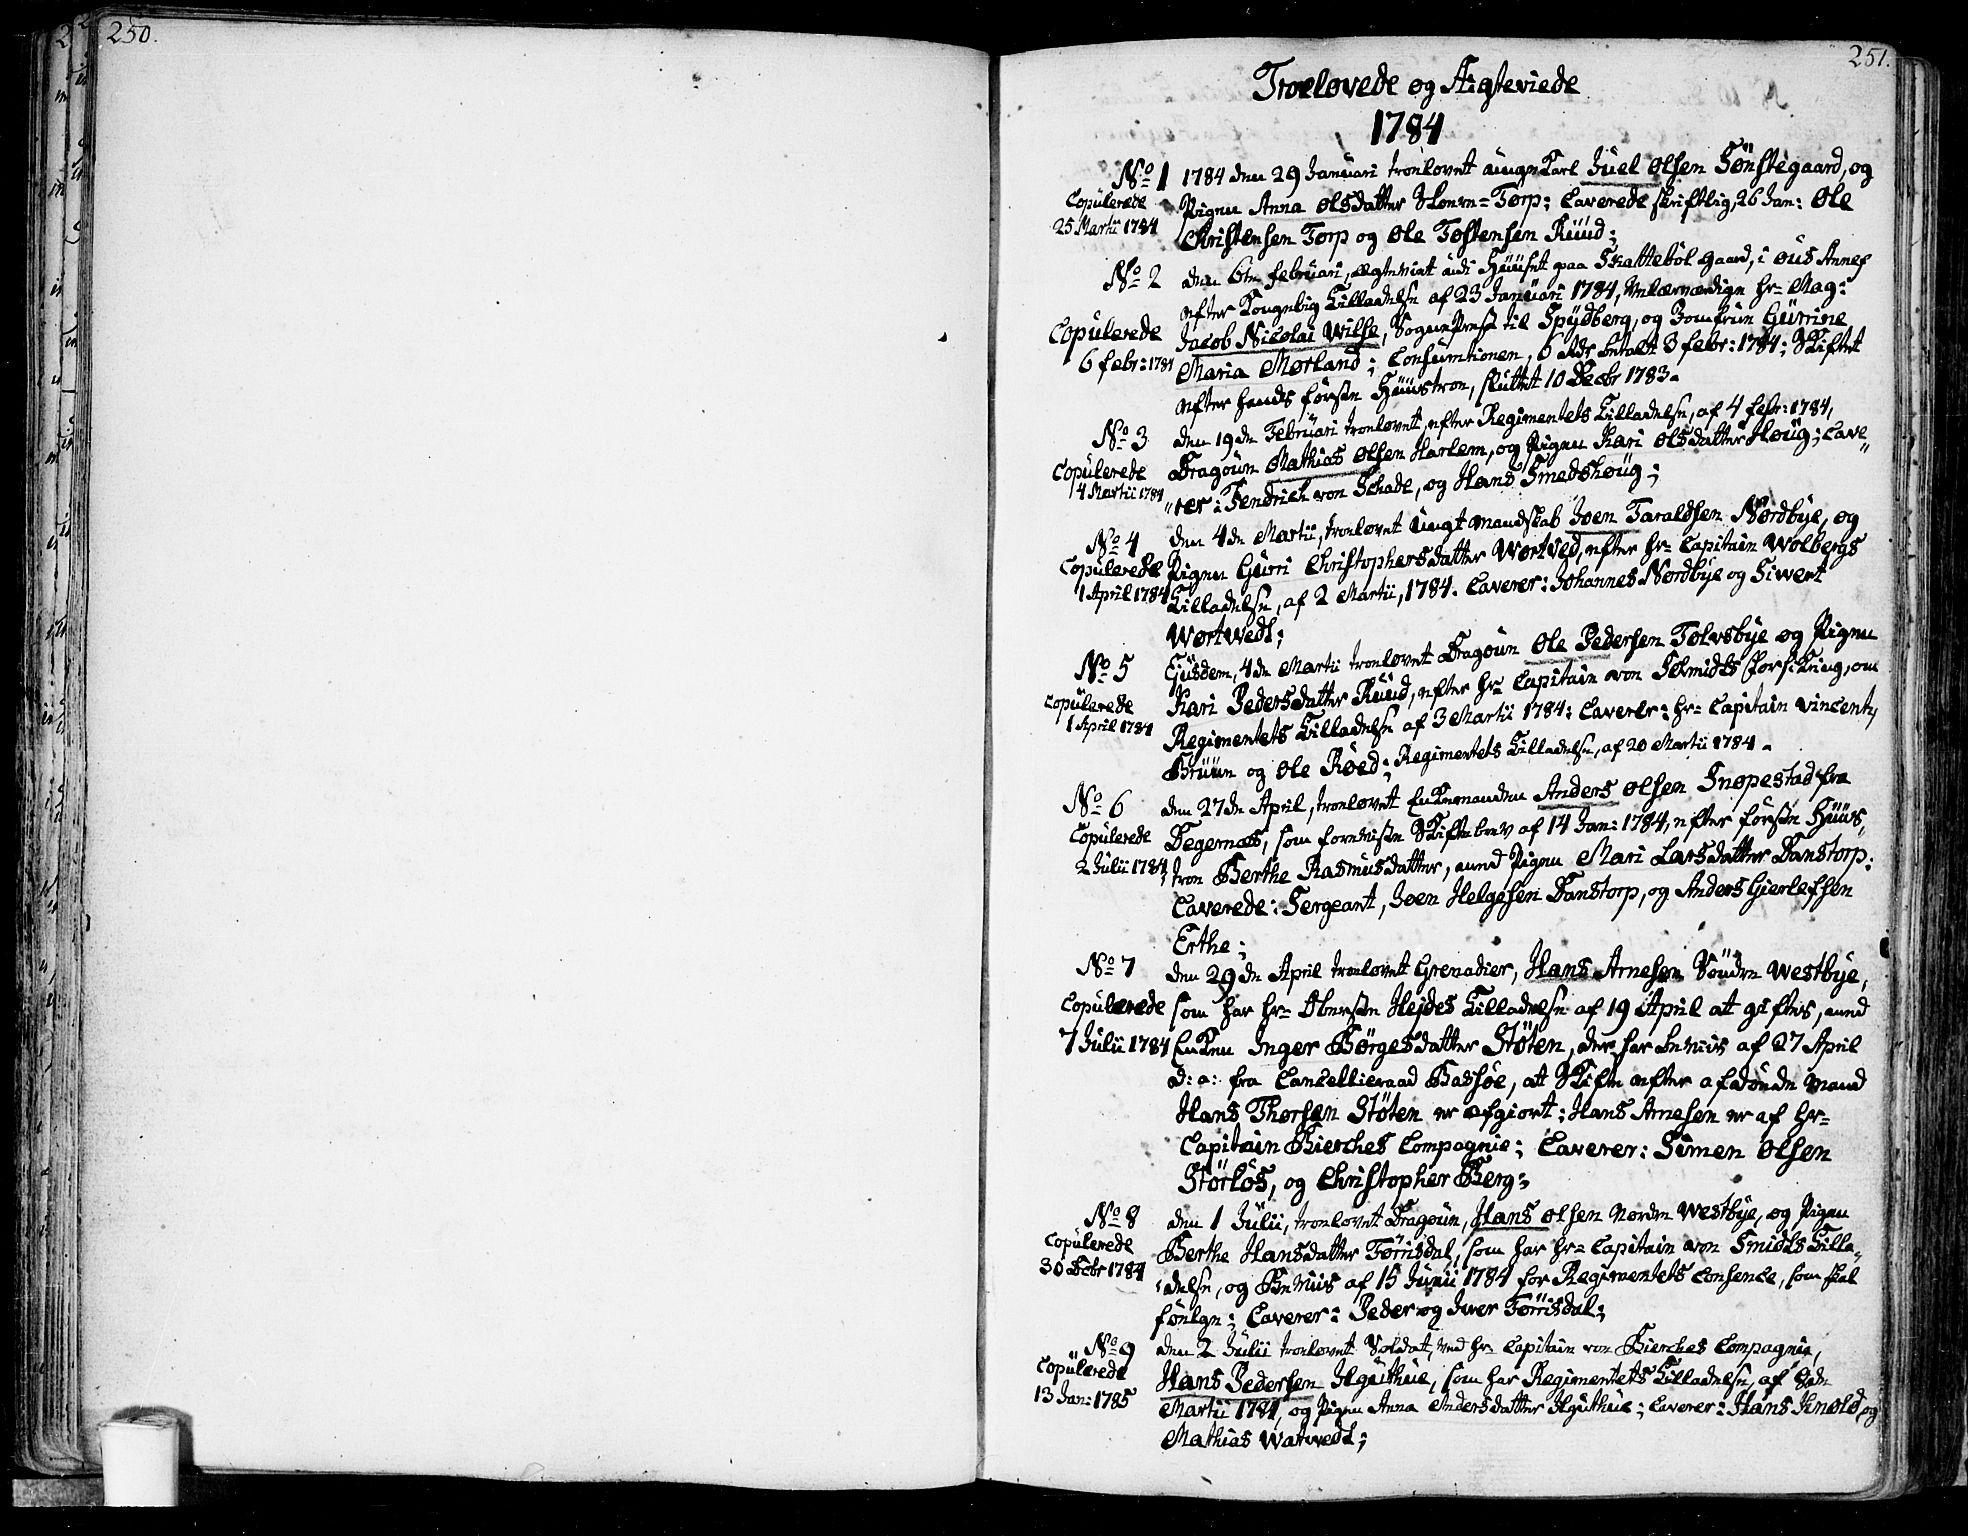 SAO, Rakkestad prestekontor Kirkebøker, F/Fa/L0005: Parish register (official) no. I 5, 1784-1814, p. 250-251